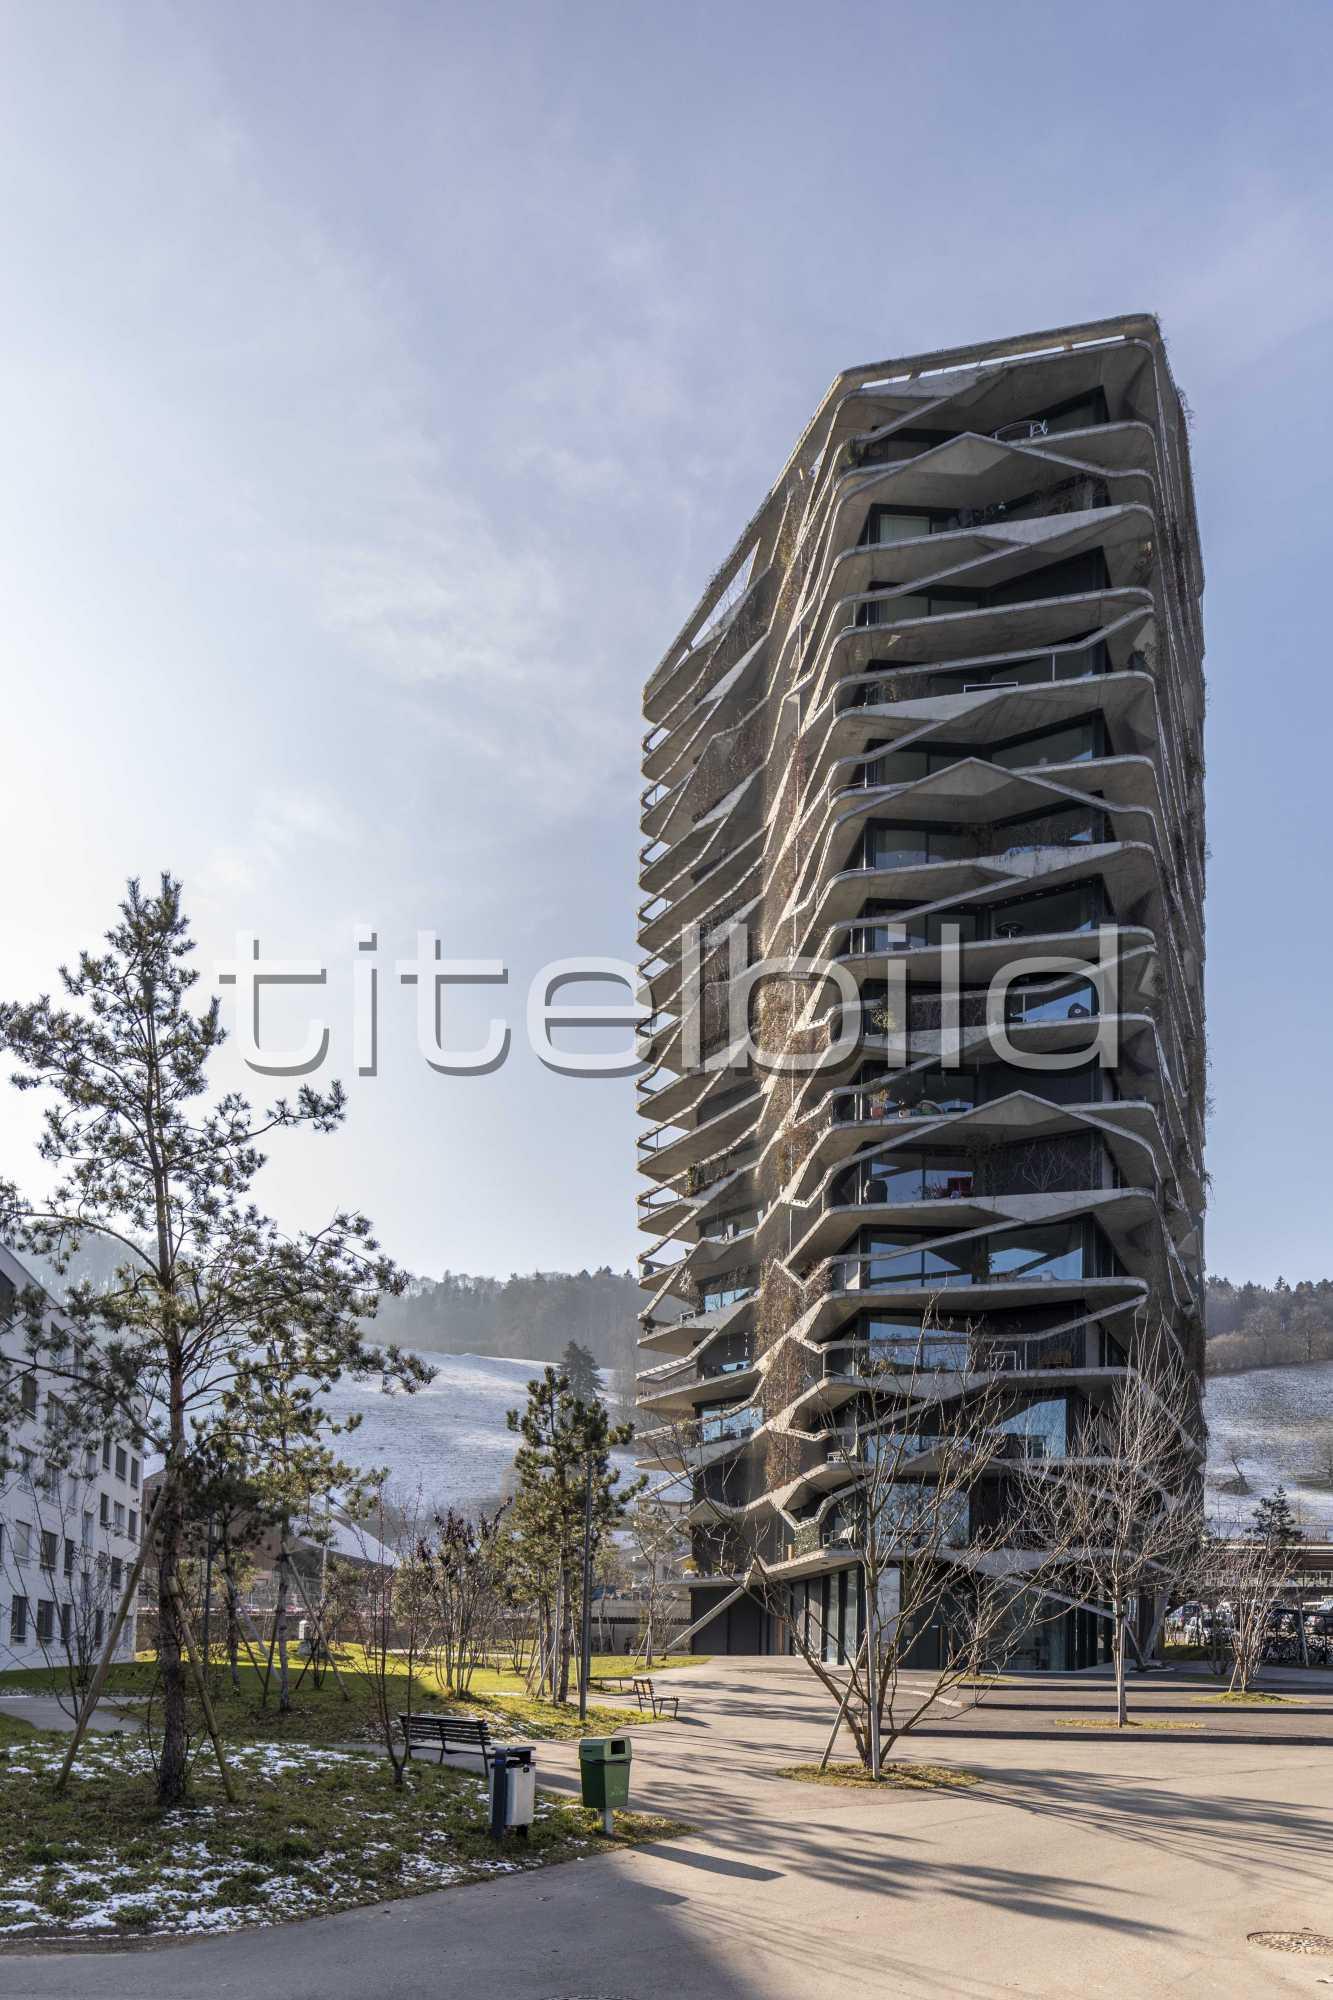 Projektbild-Nr. 6: Garden Tower Bächtelenpark Wabern